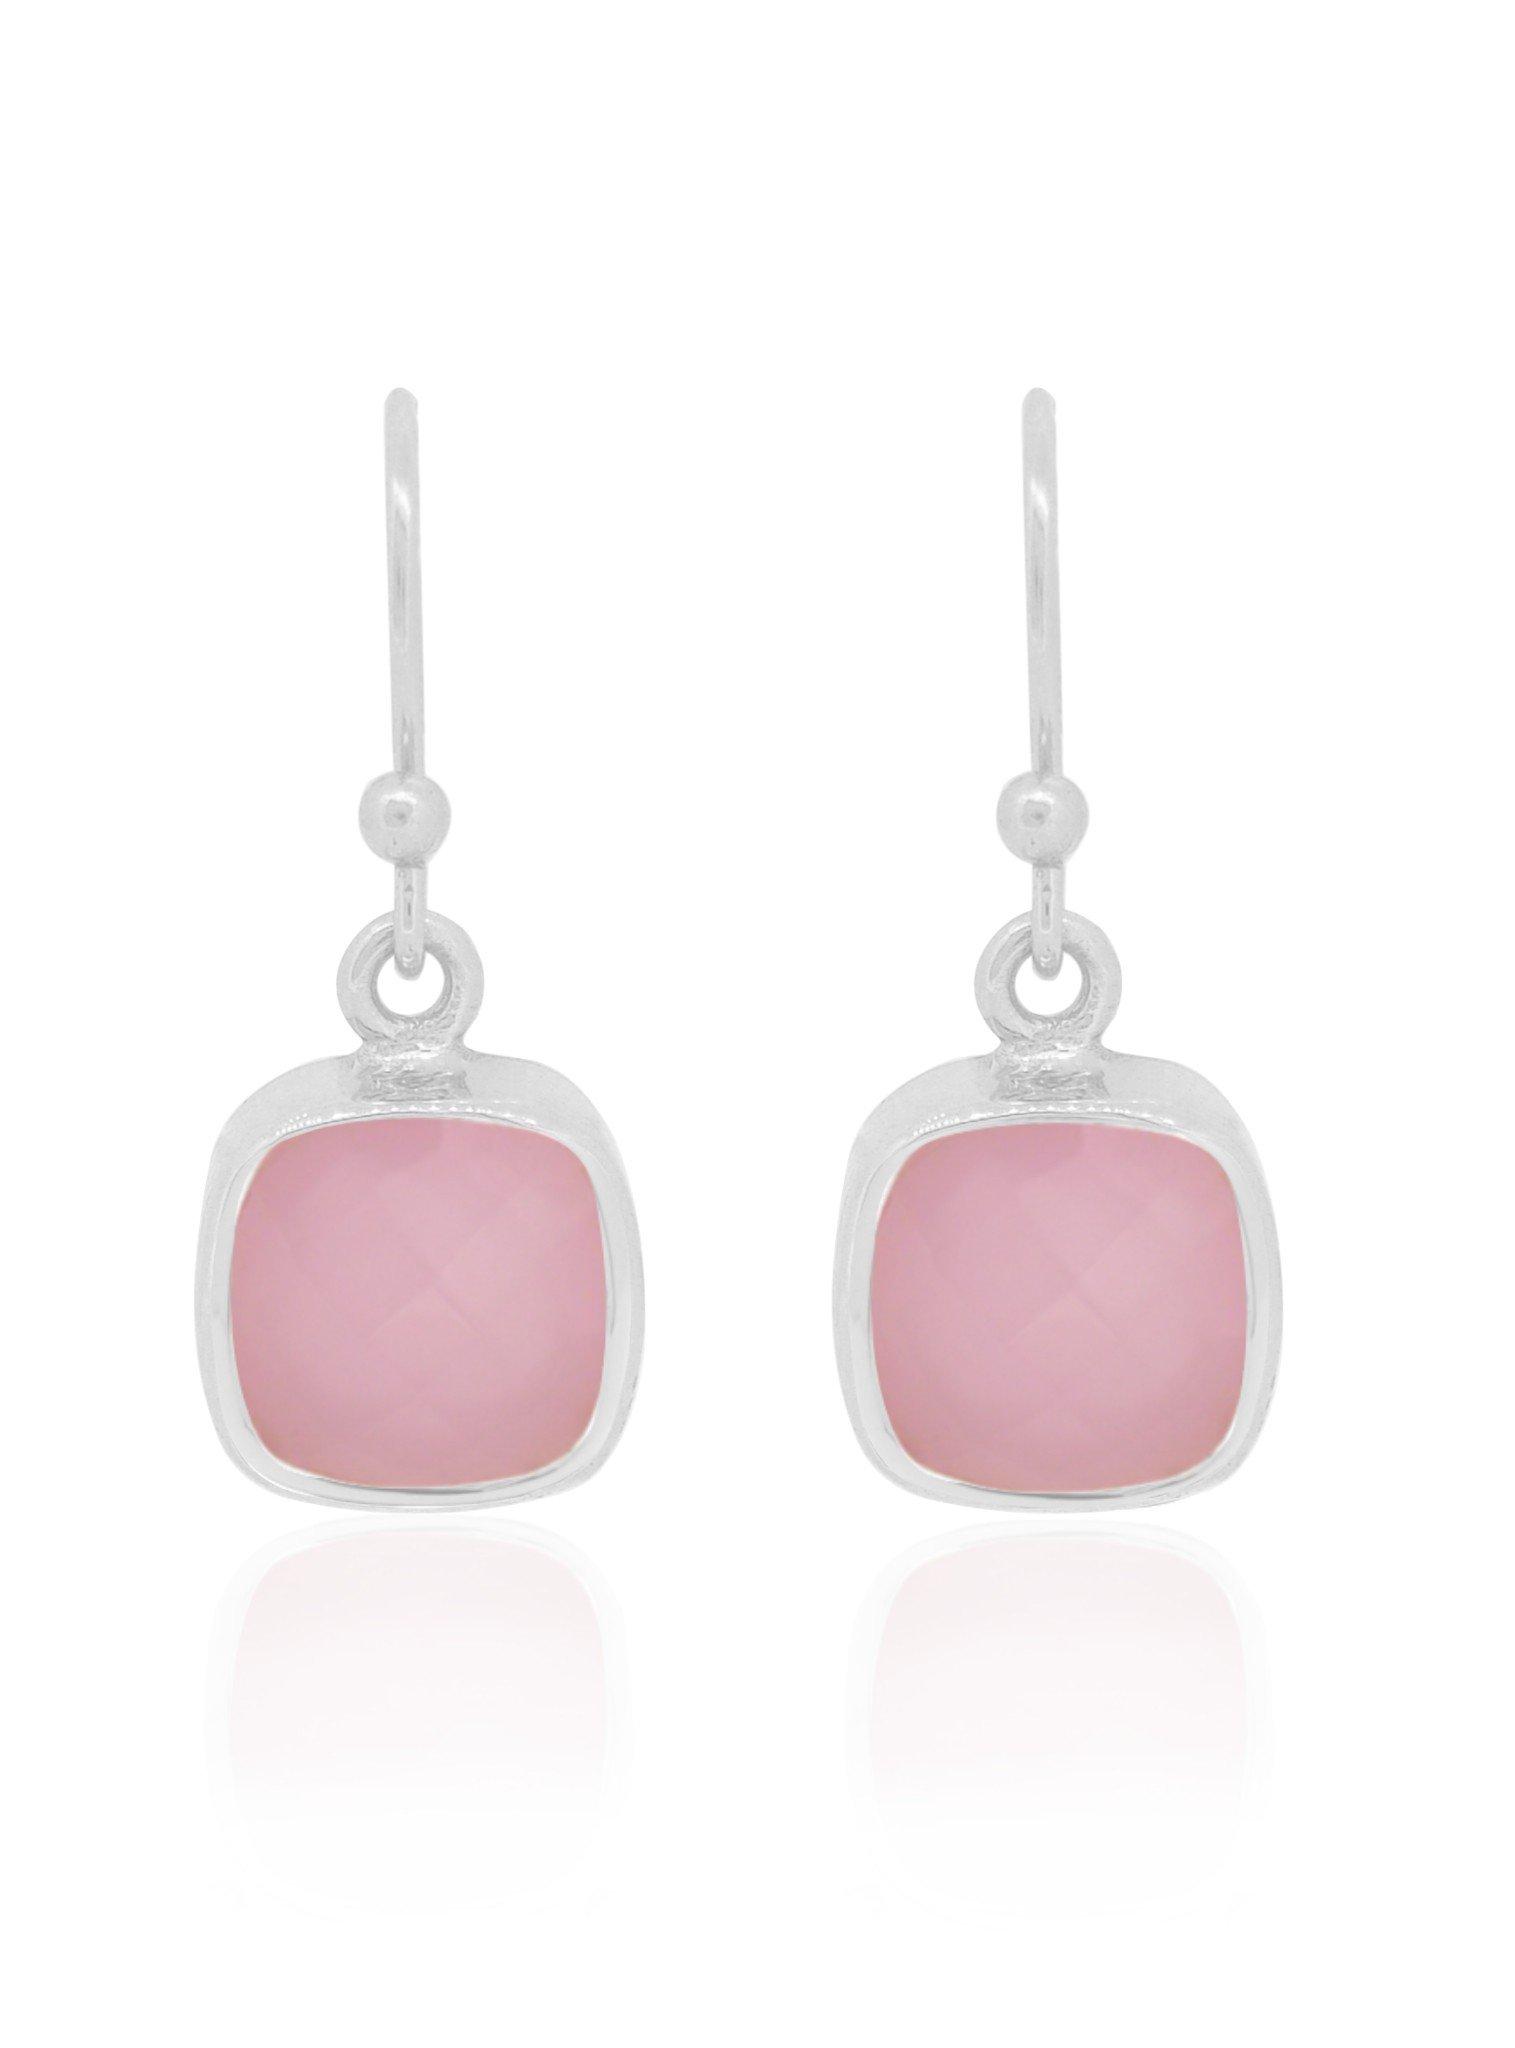 Indie Pink Chalcedony Gemstone Earrings in Silver